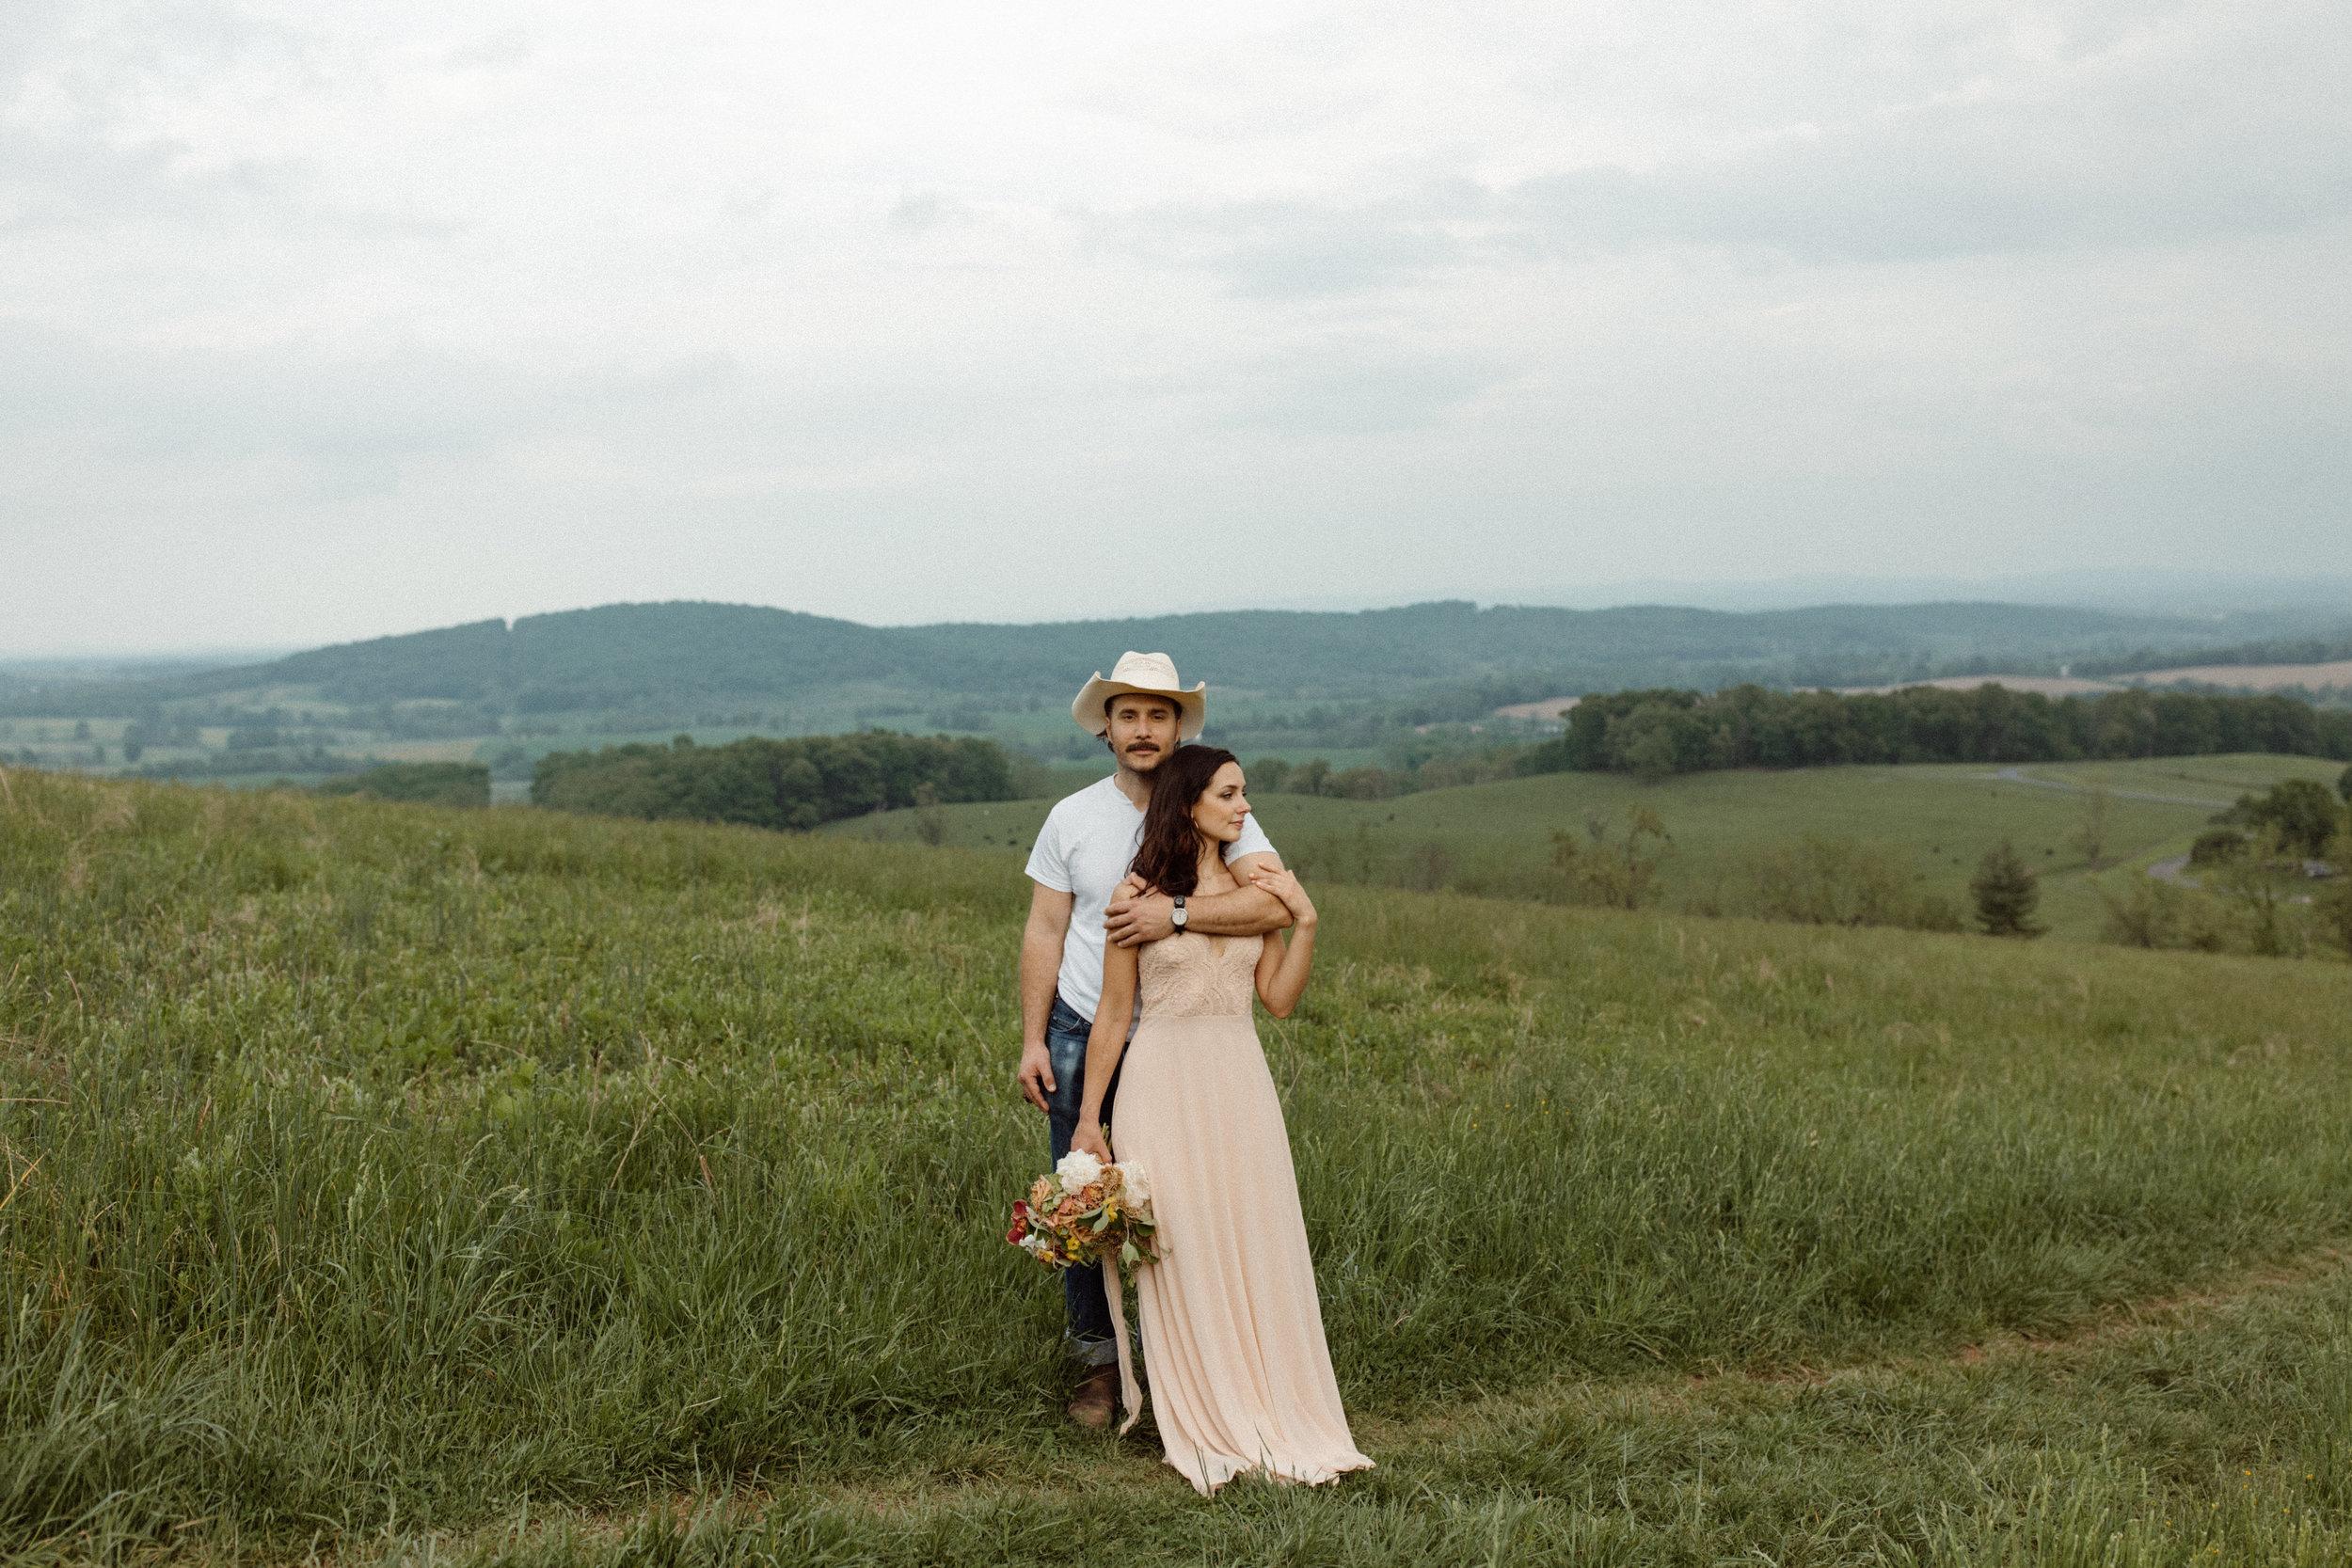 kelsey&mark-engagement-skymeadows-2019-peytoncurry-9321.jpg